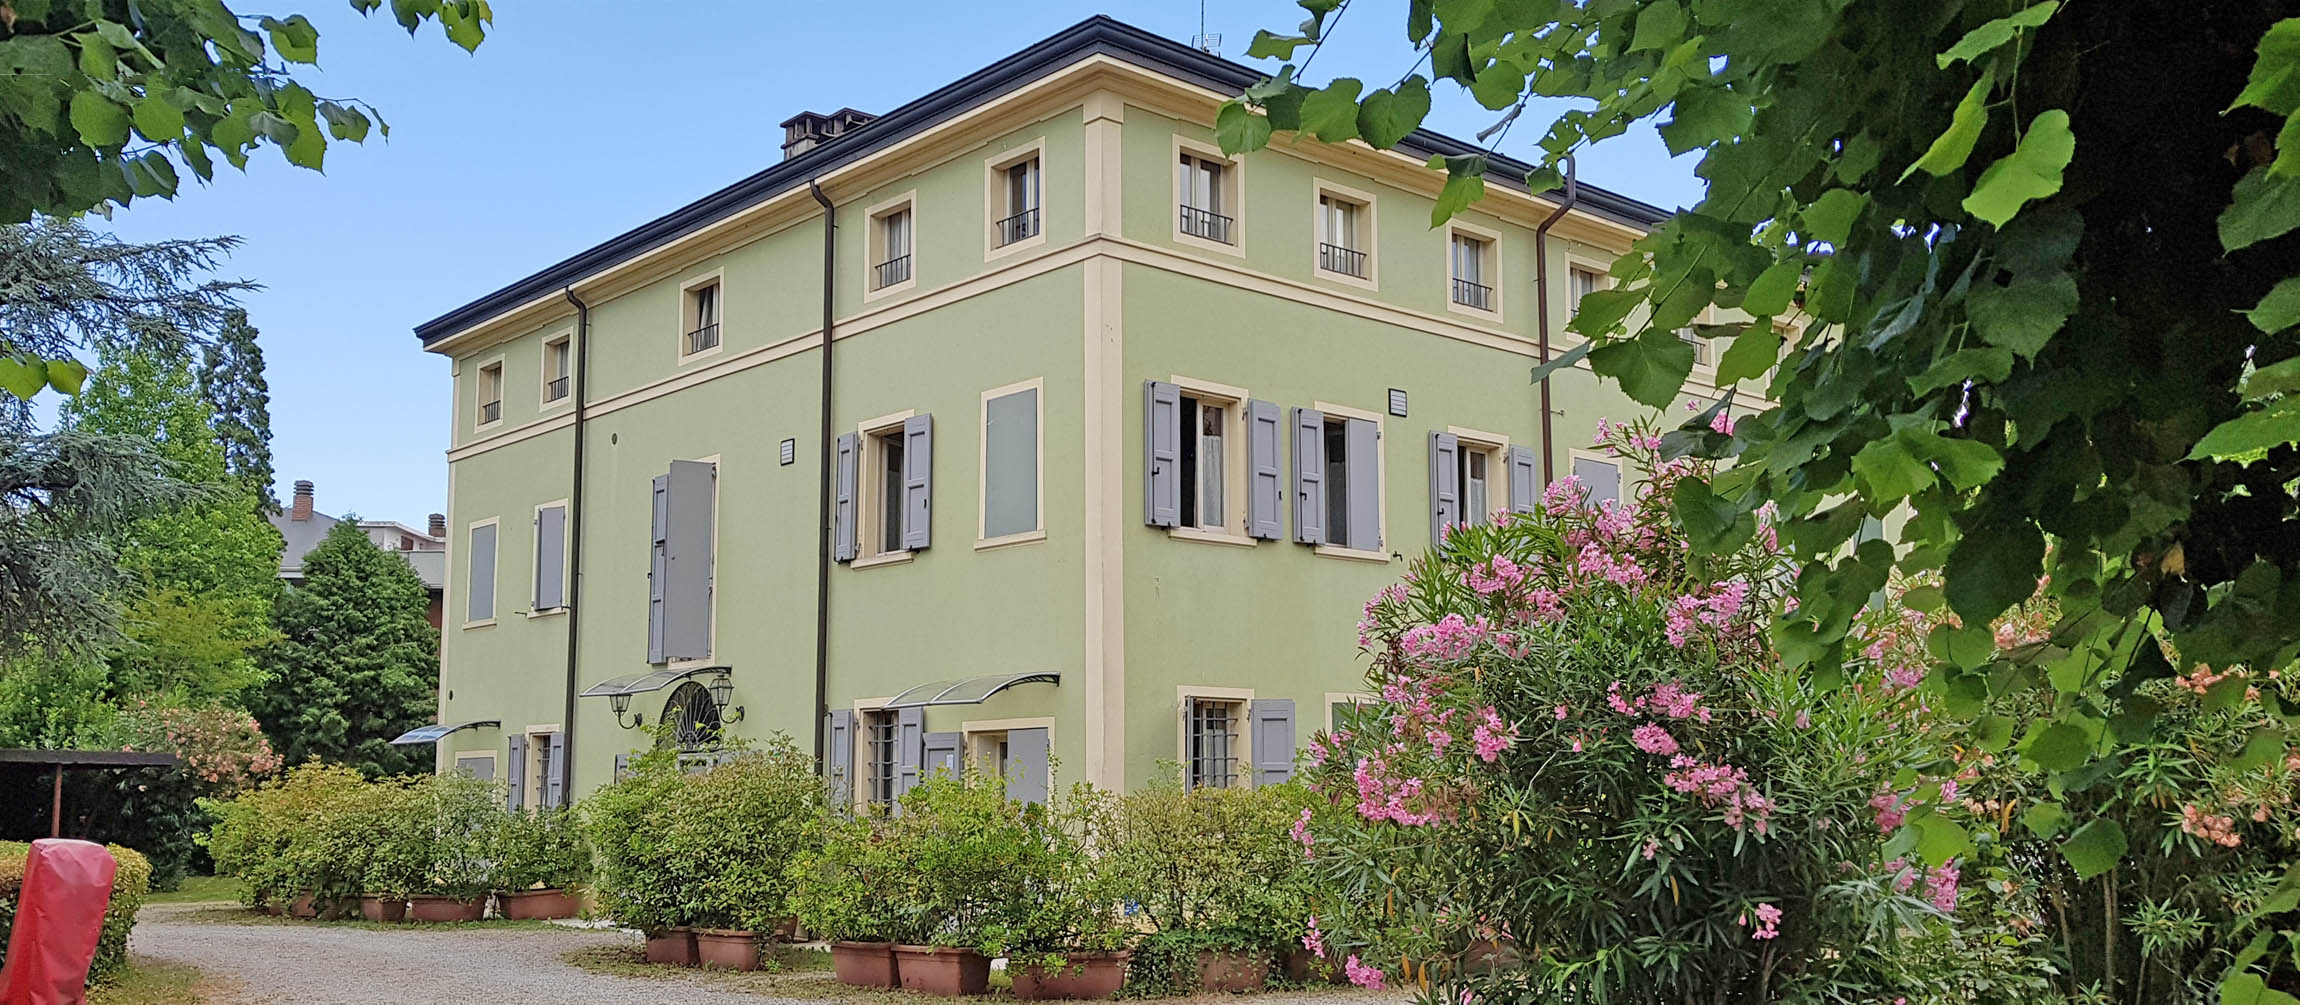 Villa Stufler Residence a modena